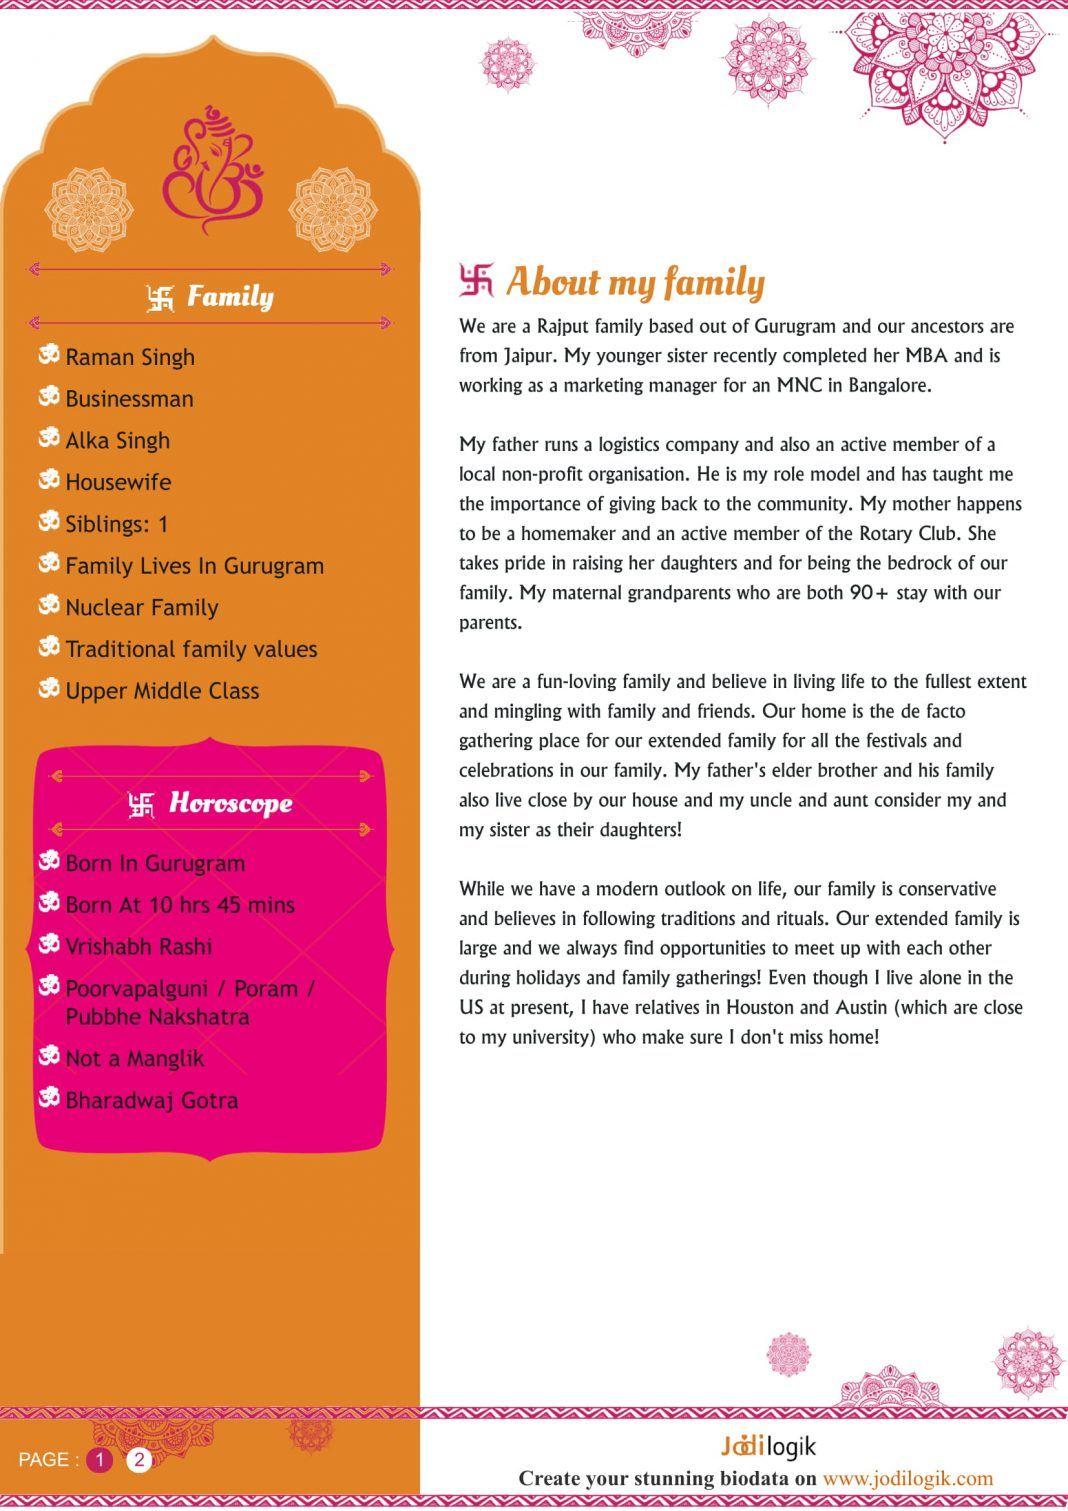 Hindu matrimonial resume bio data for marriage biodata